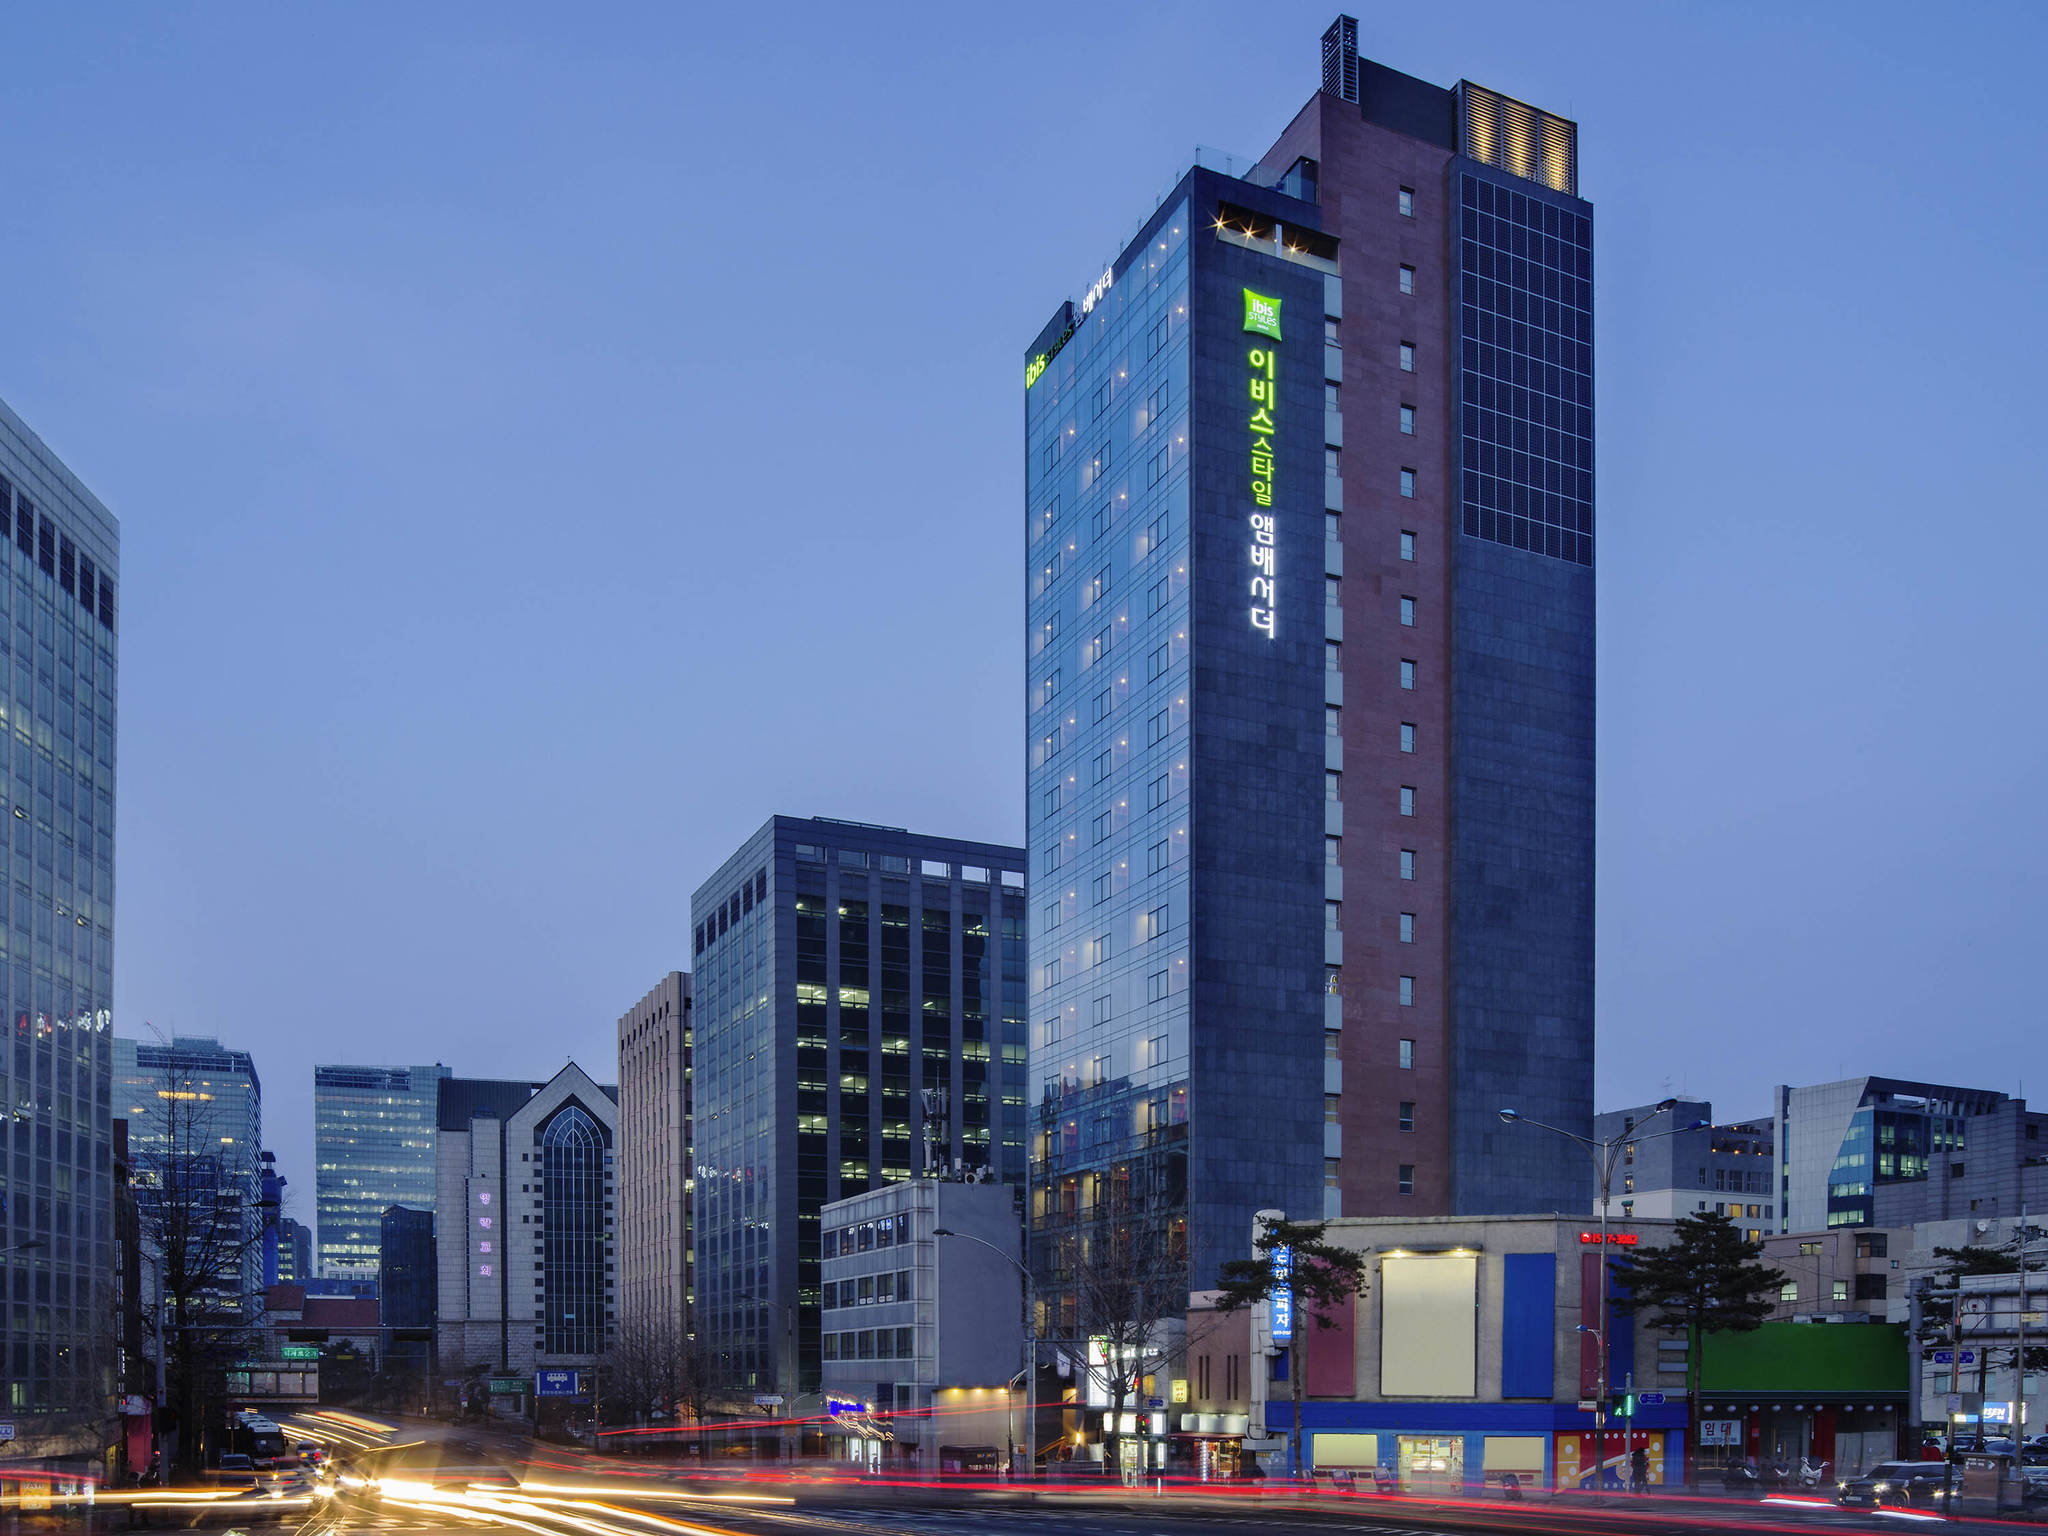 فندق - فندق ibis Styles أمباسادور سيول ميونج دونج